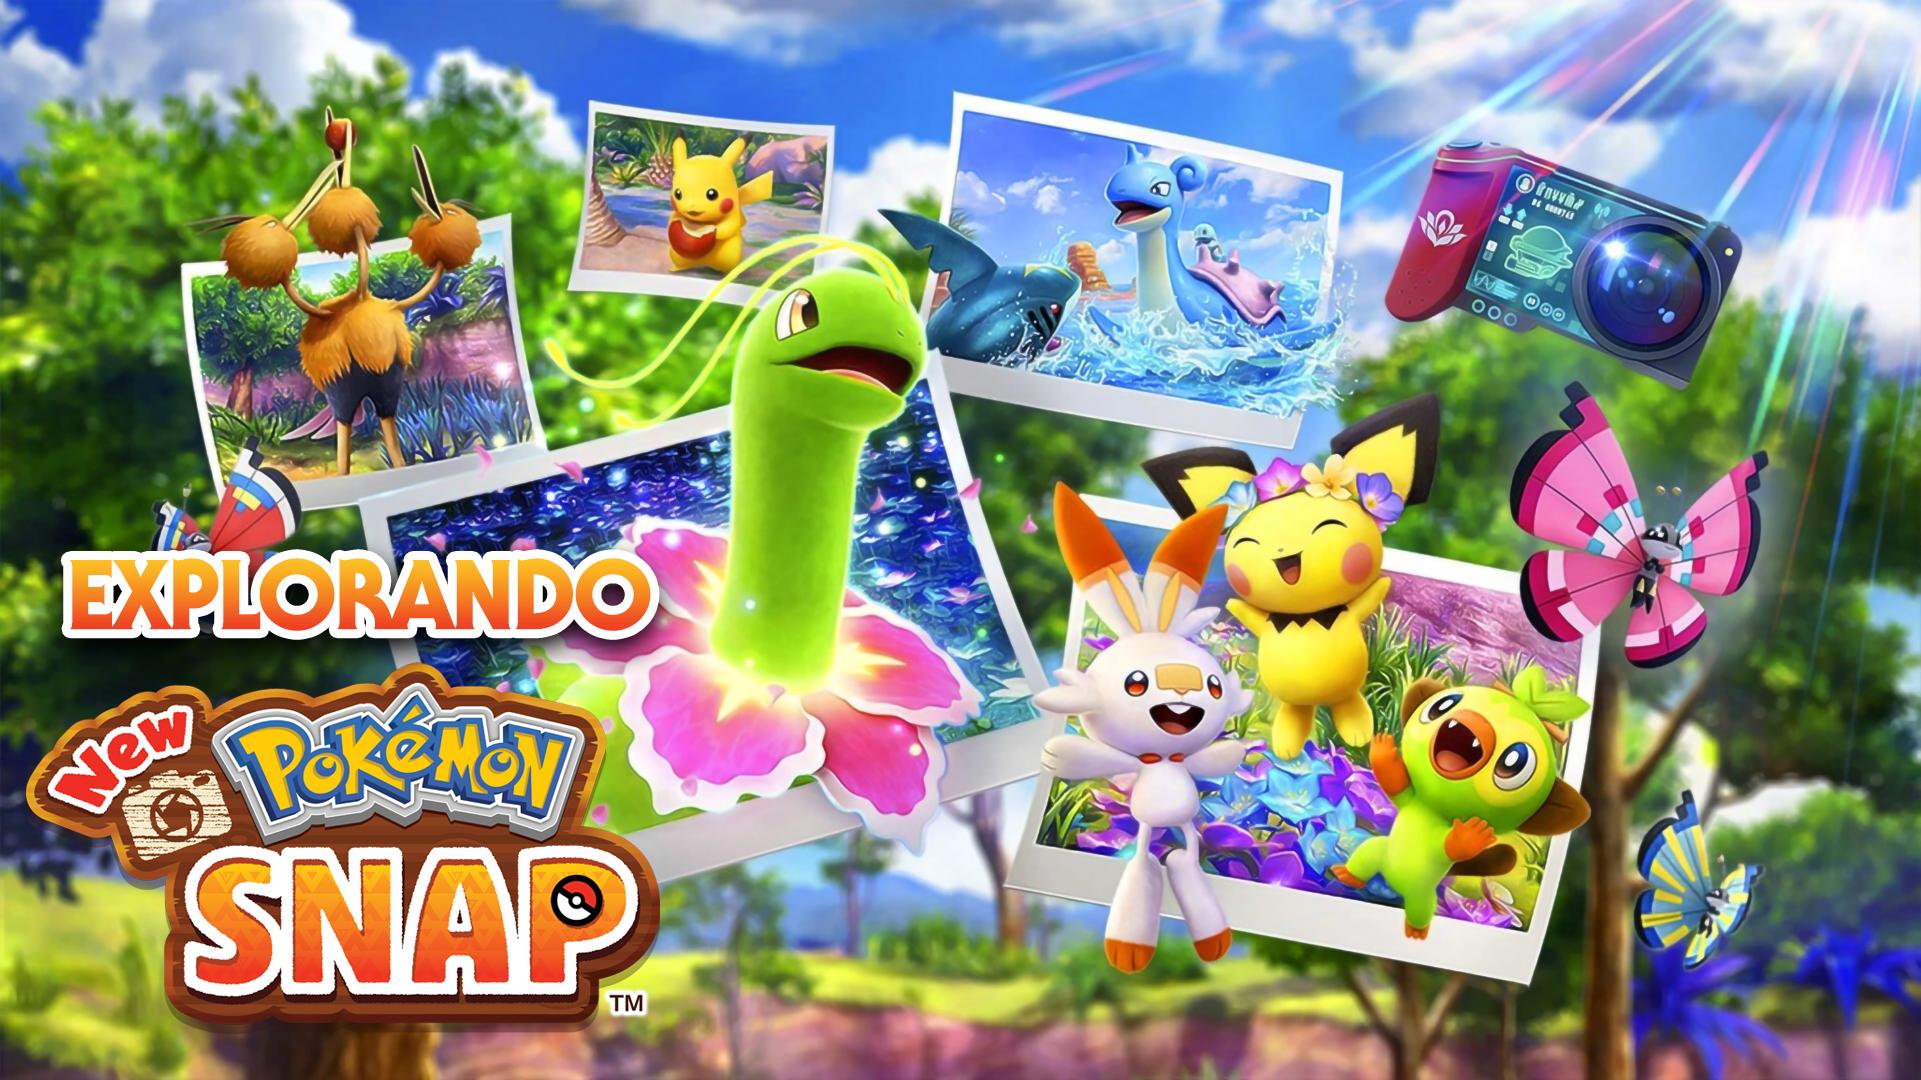 Explorando New Pokémon Snap